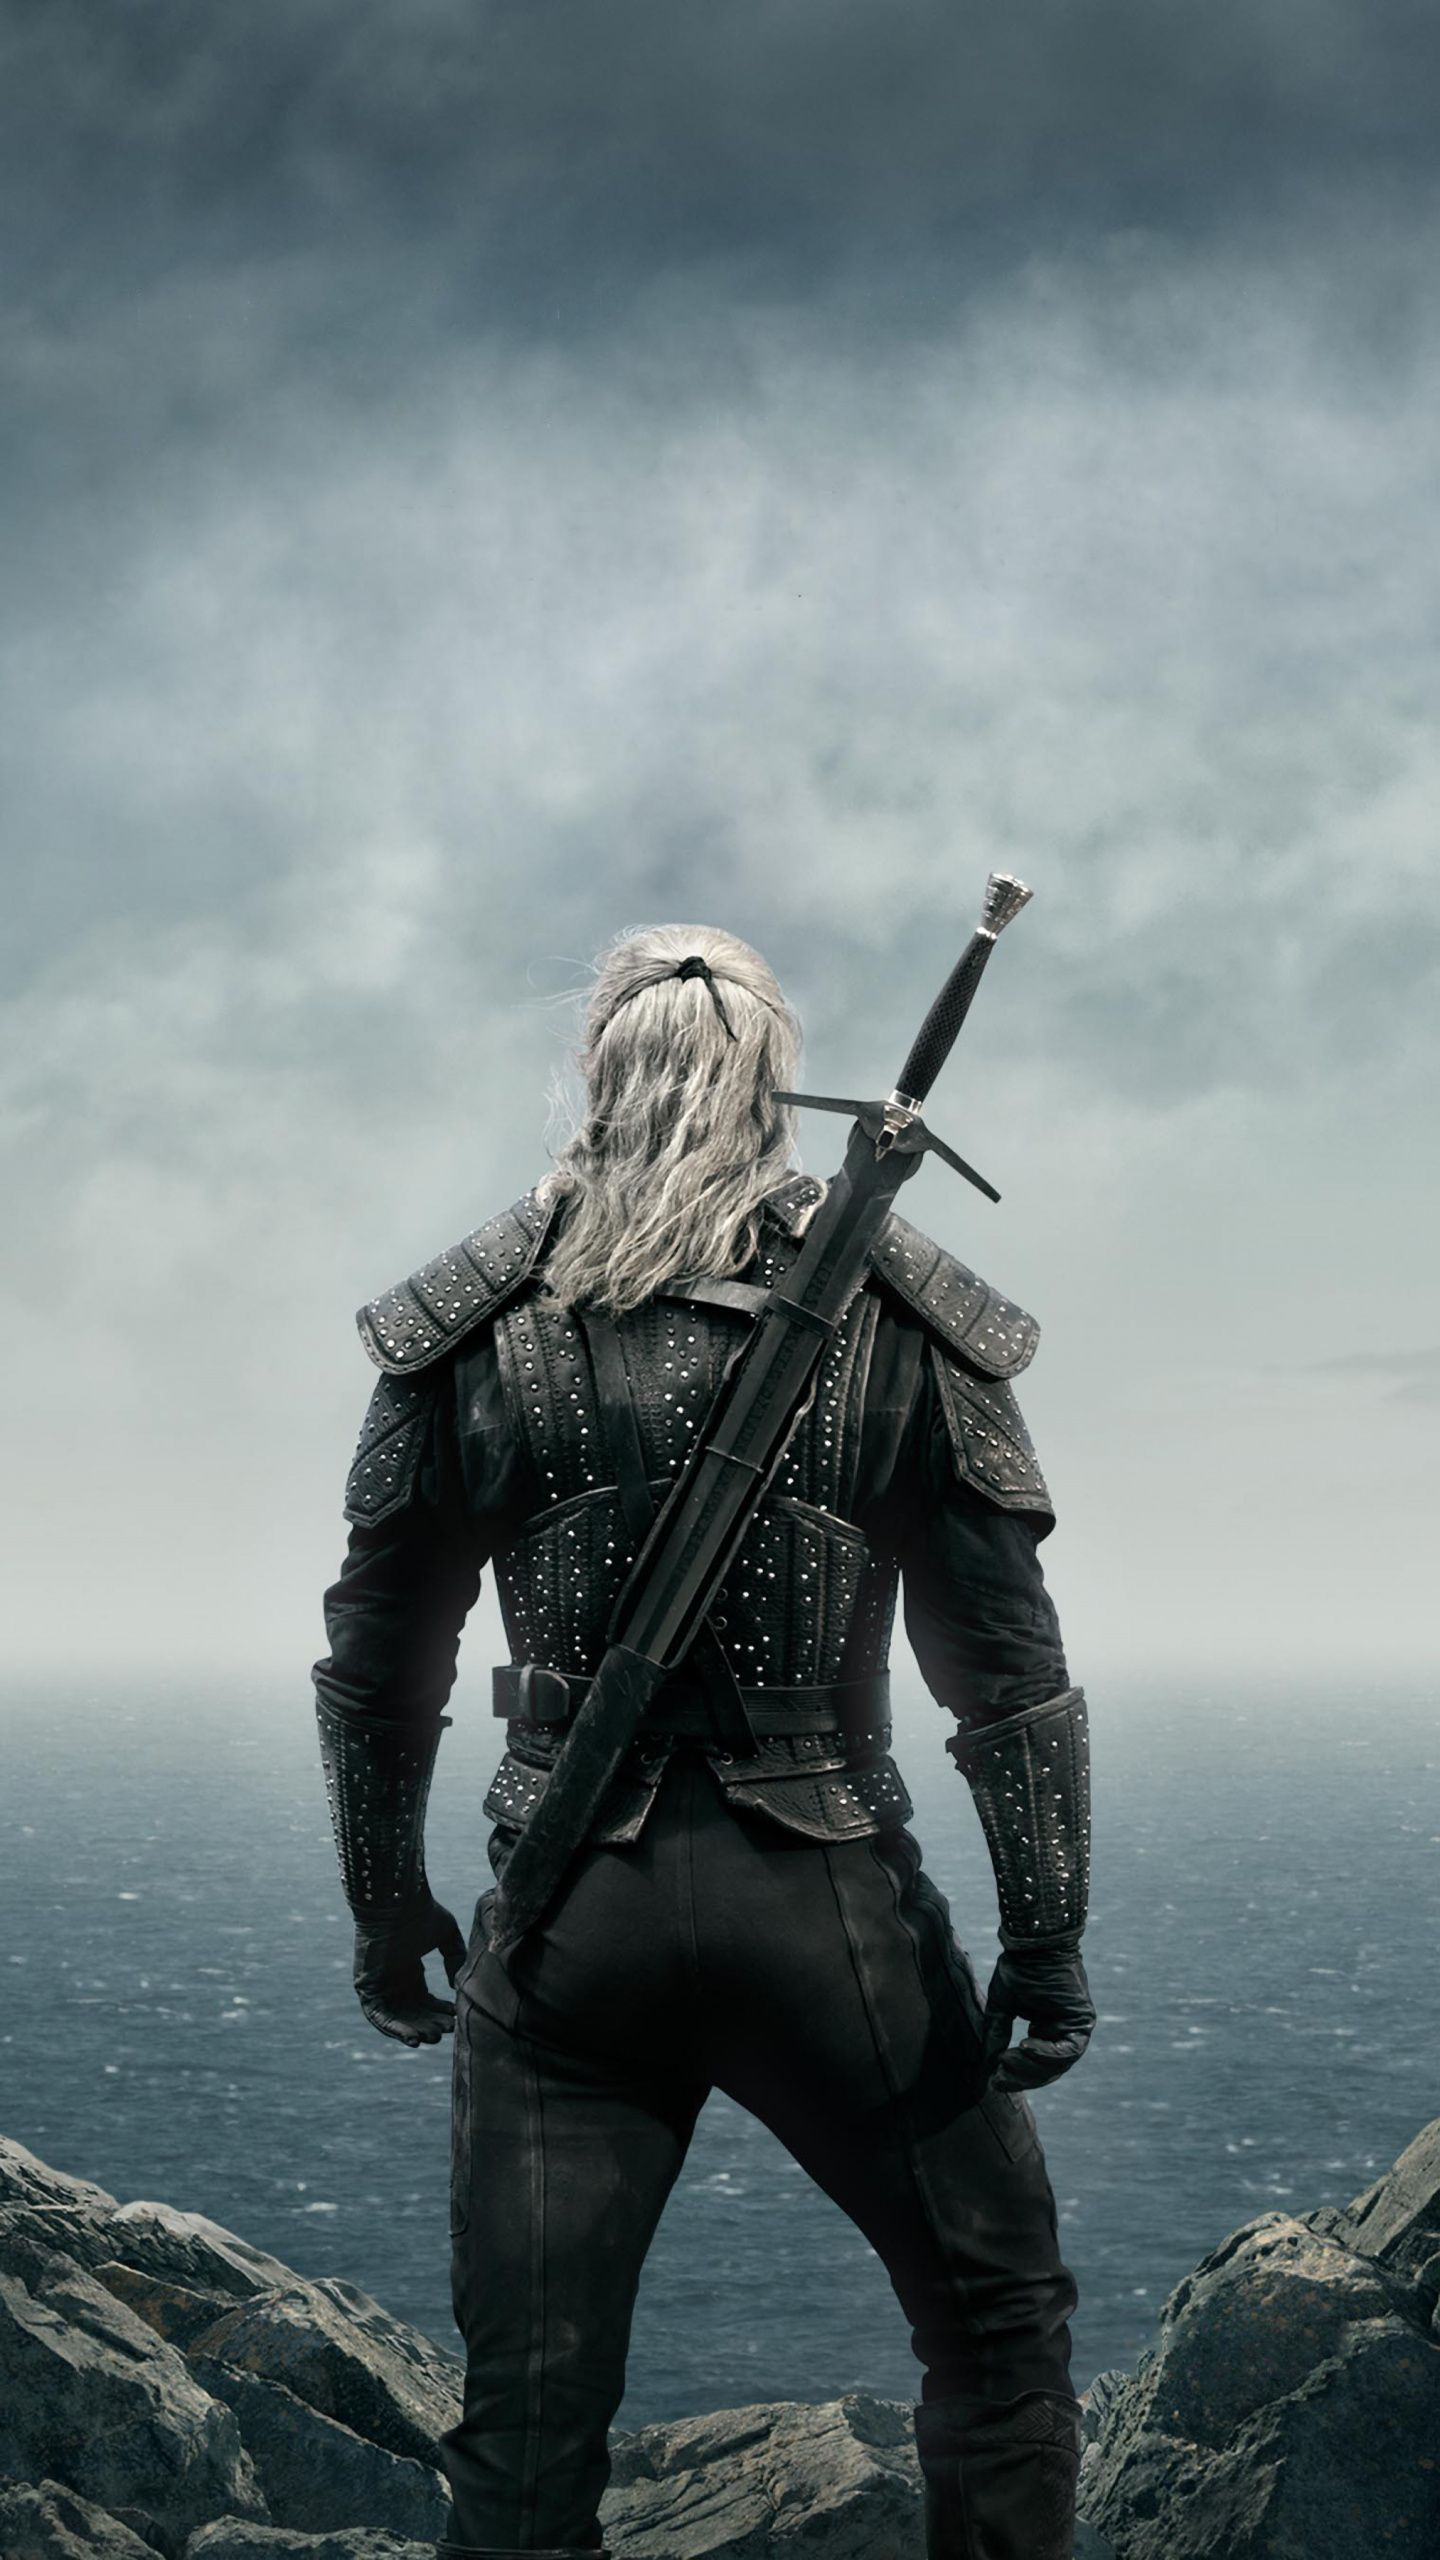 1440x2560 The Witcher Warrior 2019 Netflix Tv Show Poster Wallpaper The Witcher Geralt The Witcher Witcher Art